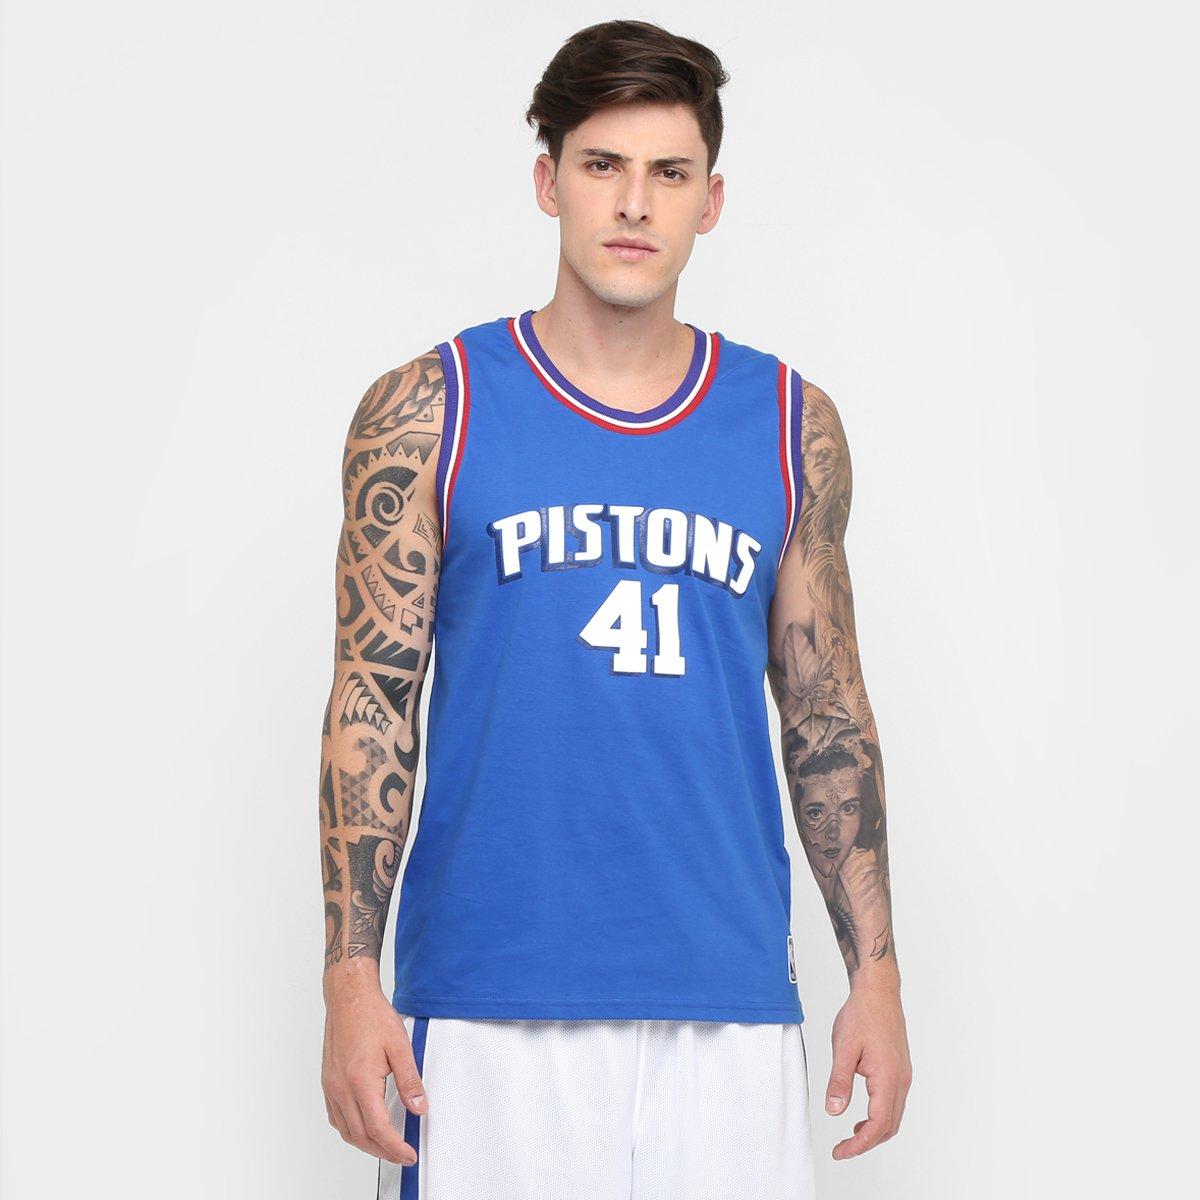 fdad75dc6 Camiseta Regata Retrô NBA Detroit Pistons - Compre Agora